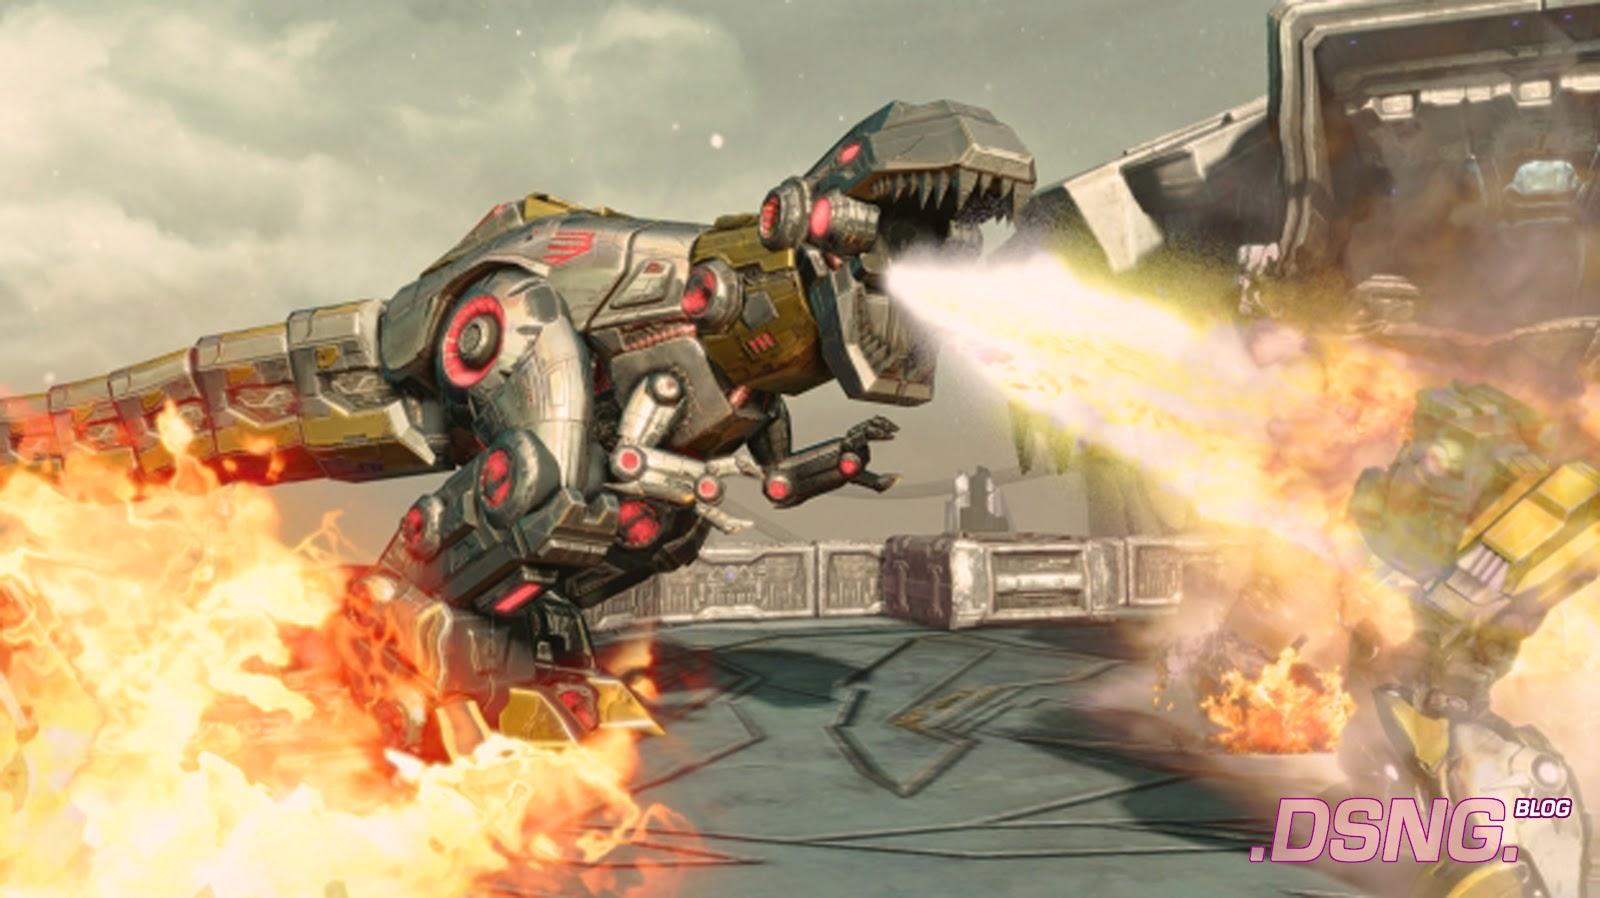 Mass Effect Fall Wallpaper Dsng S Sci Fi Megaverse Transformers Fall Of Cybertron